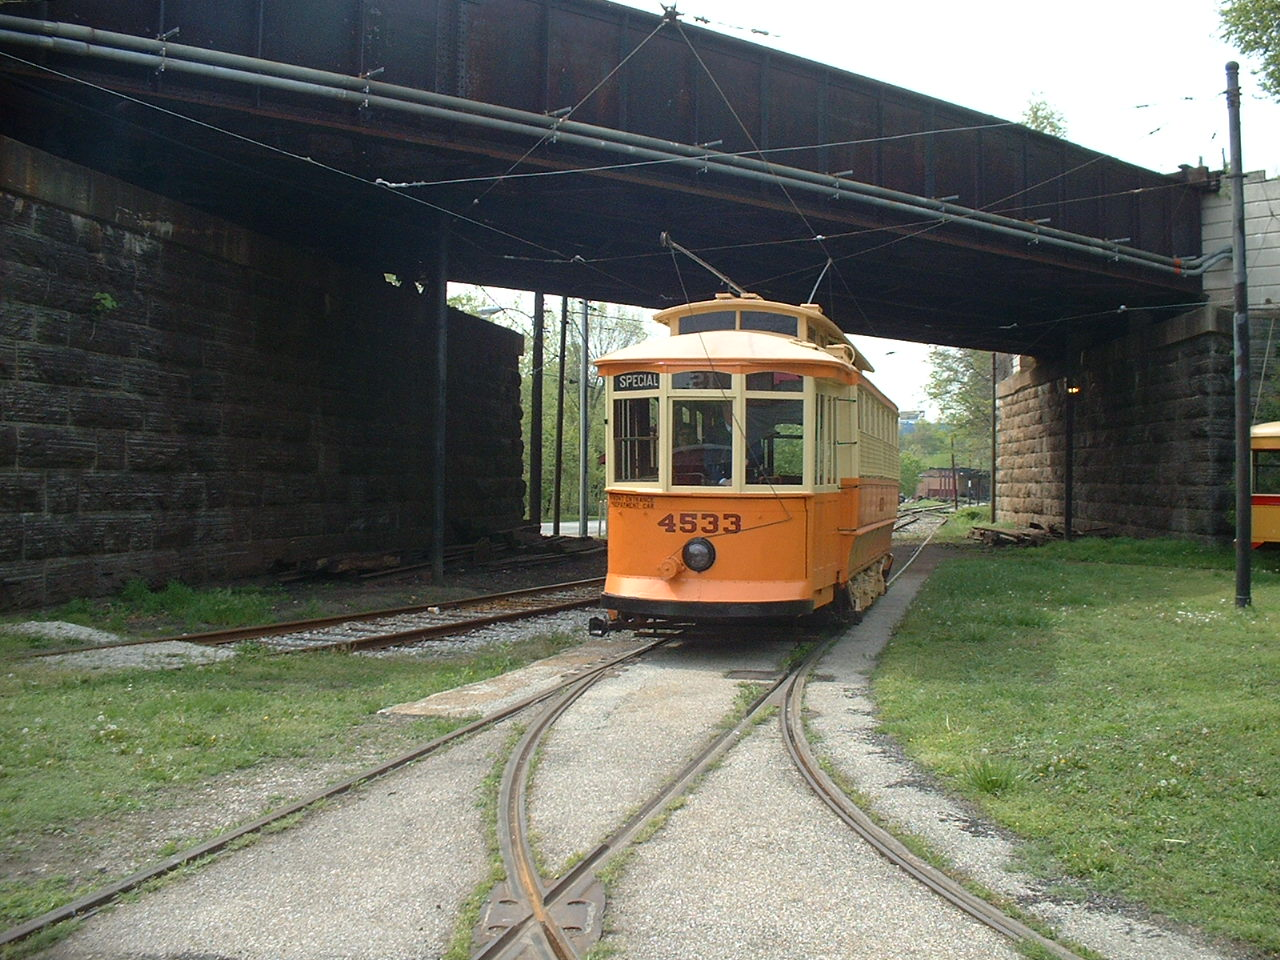 (296k, 1280x960)<br><b>Country:</b> United States<br><b>City:</b> Baltimore, MD<br><b>System:</b> Baltimore Streetcar Museum <br><b>Car:</b>  4533 <br><b>Photo by:</b> Dan Lawrence<br><b>Date:</b> 4/27/2002<br><b>Viewed (this week/total):</b> 0 / 2424